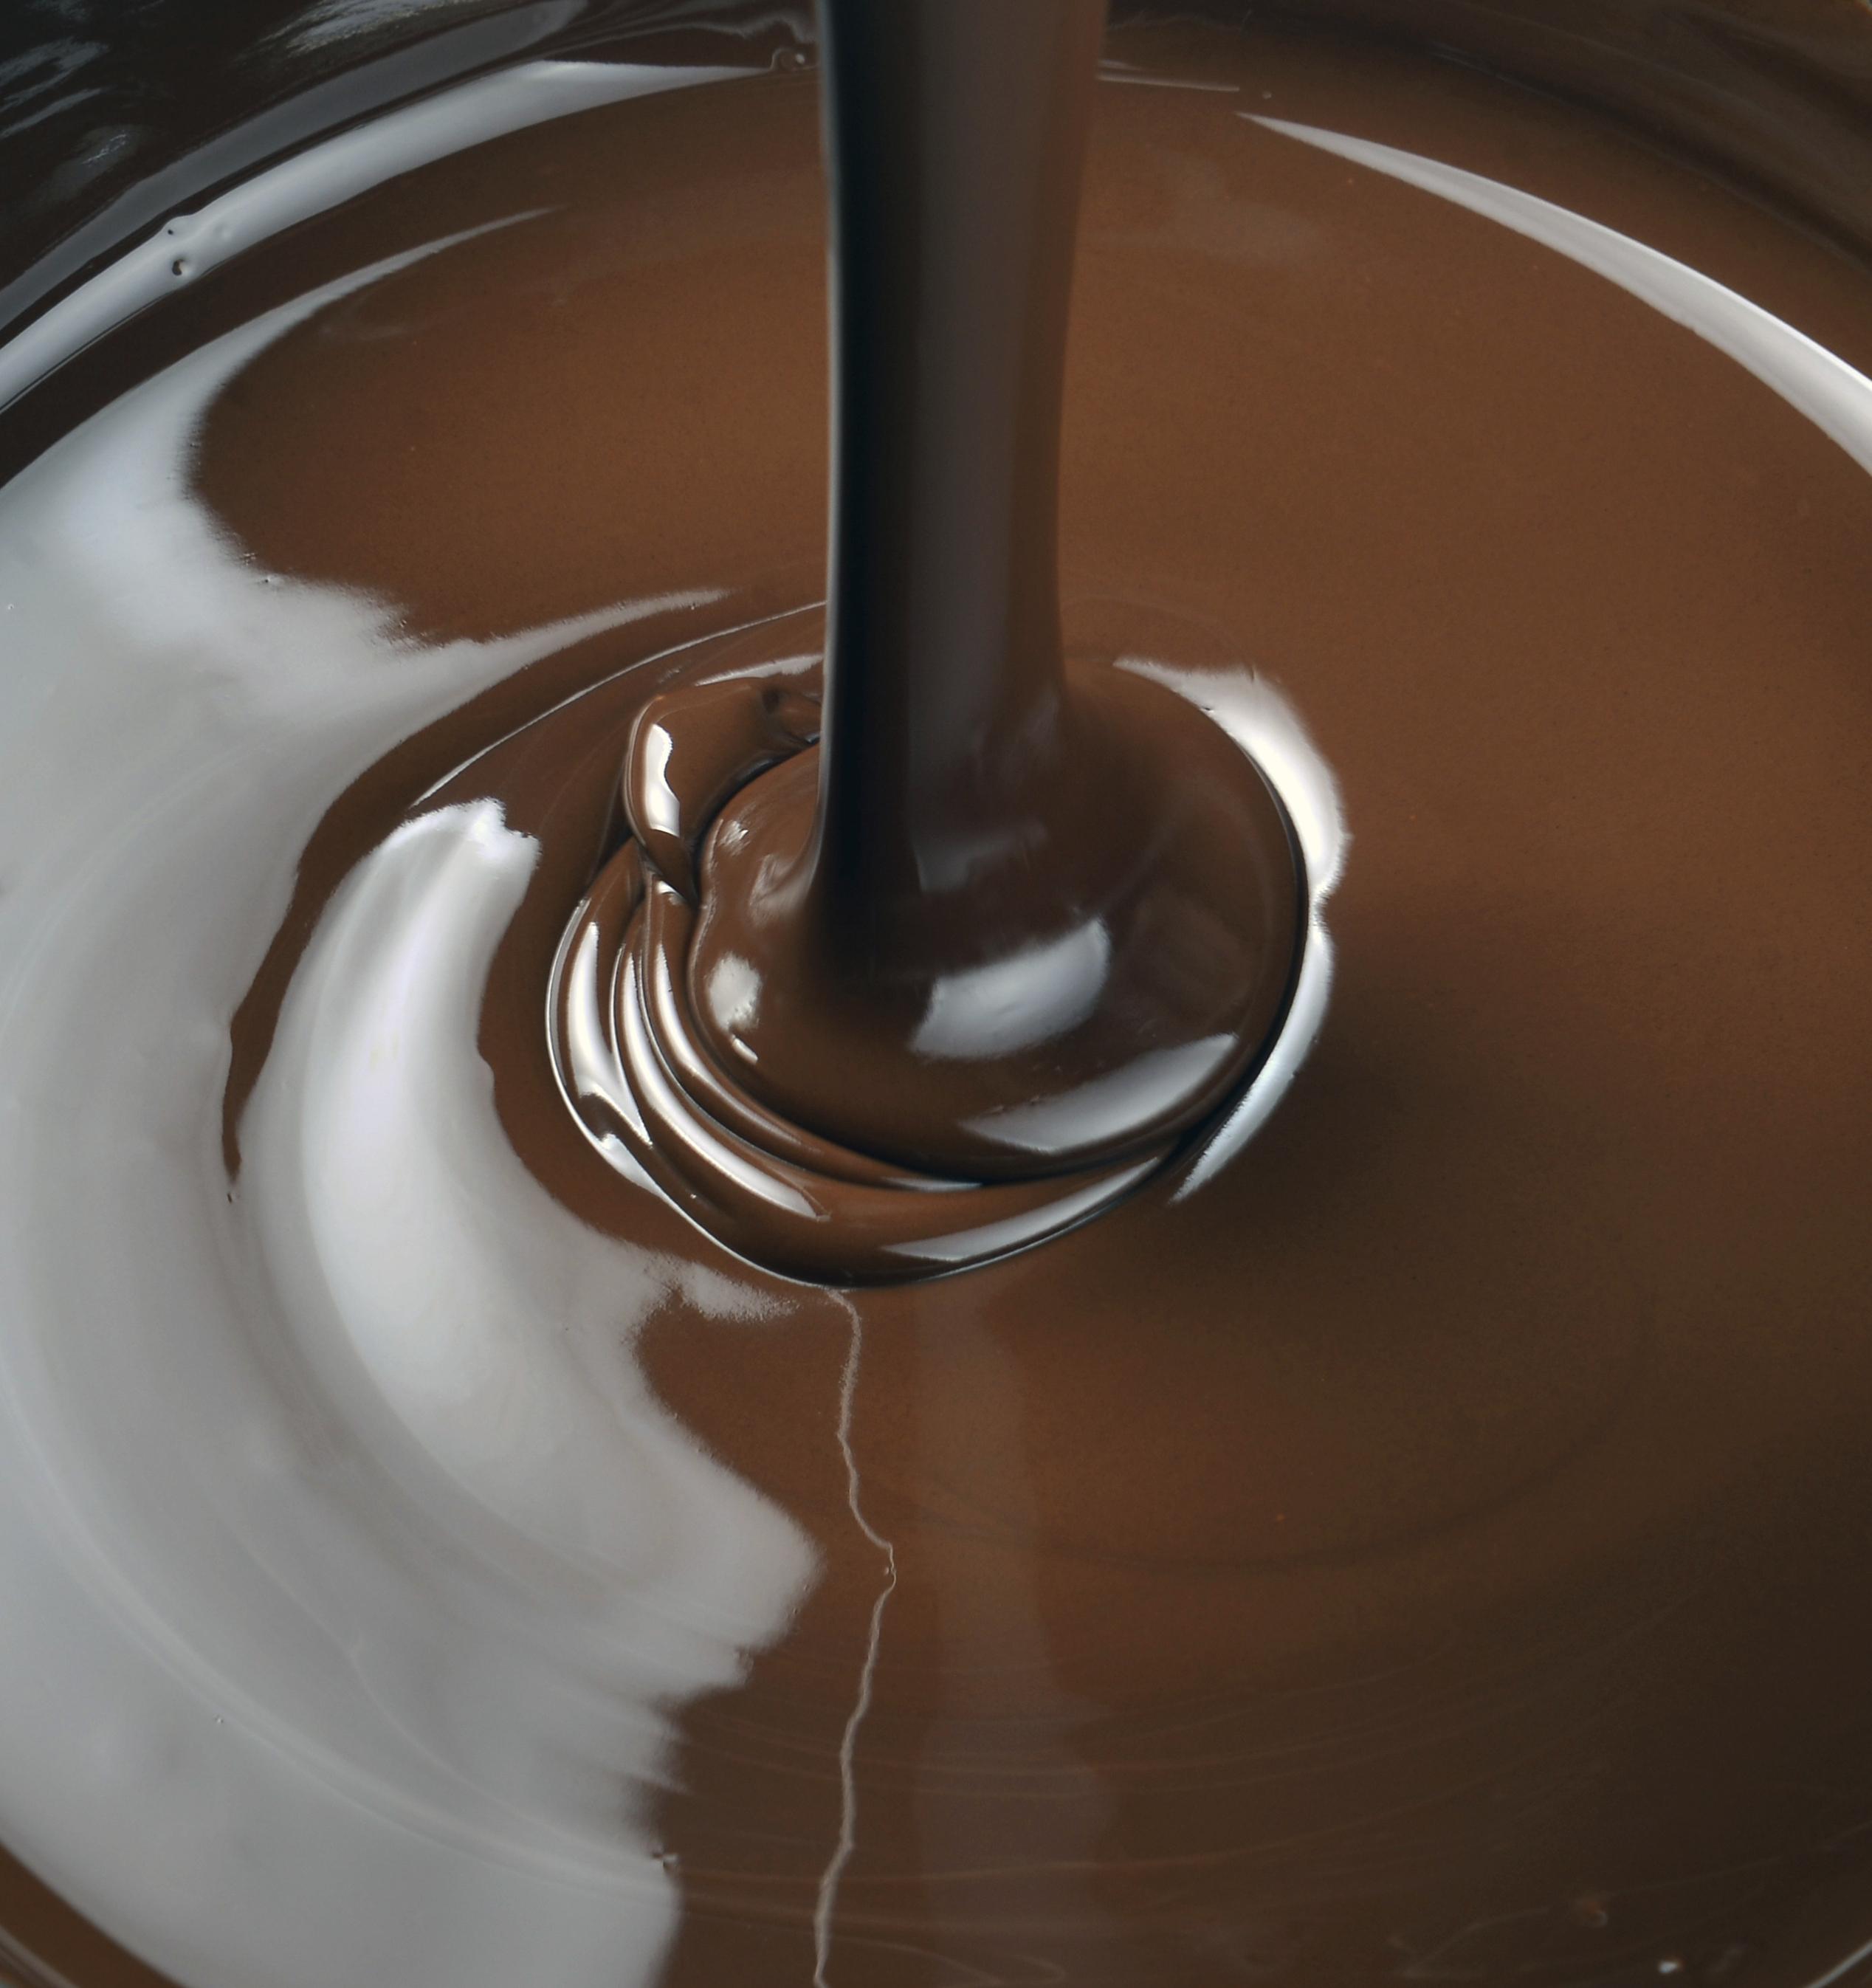 Cubierta de cacao